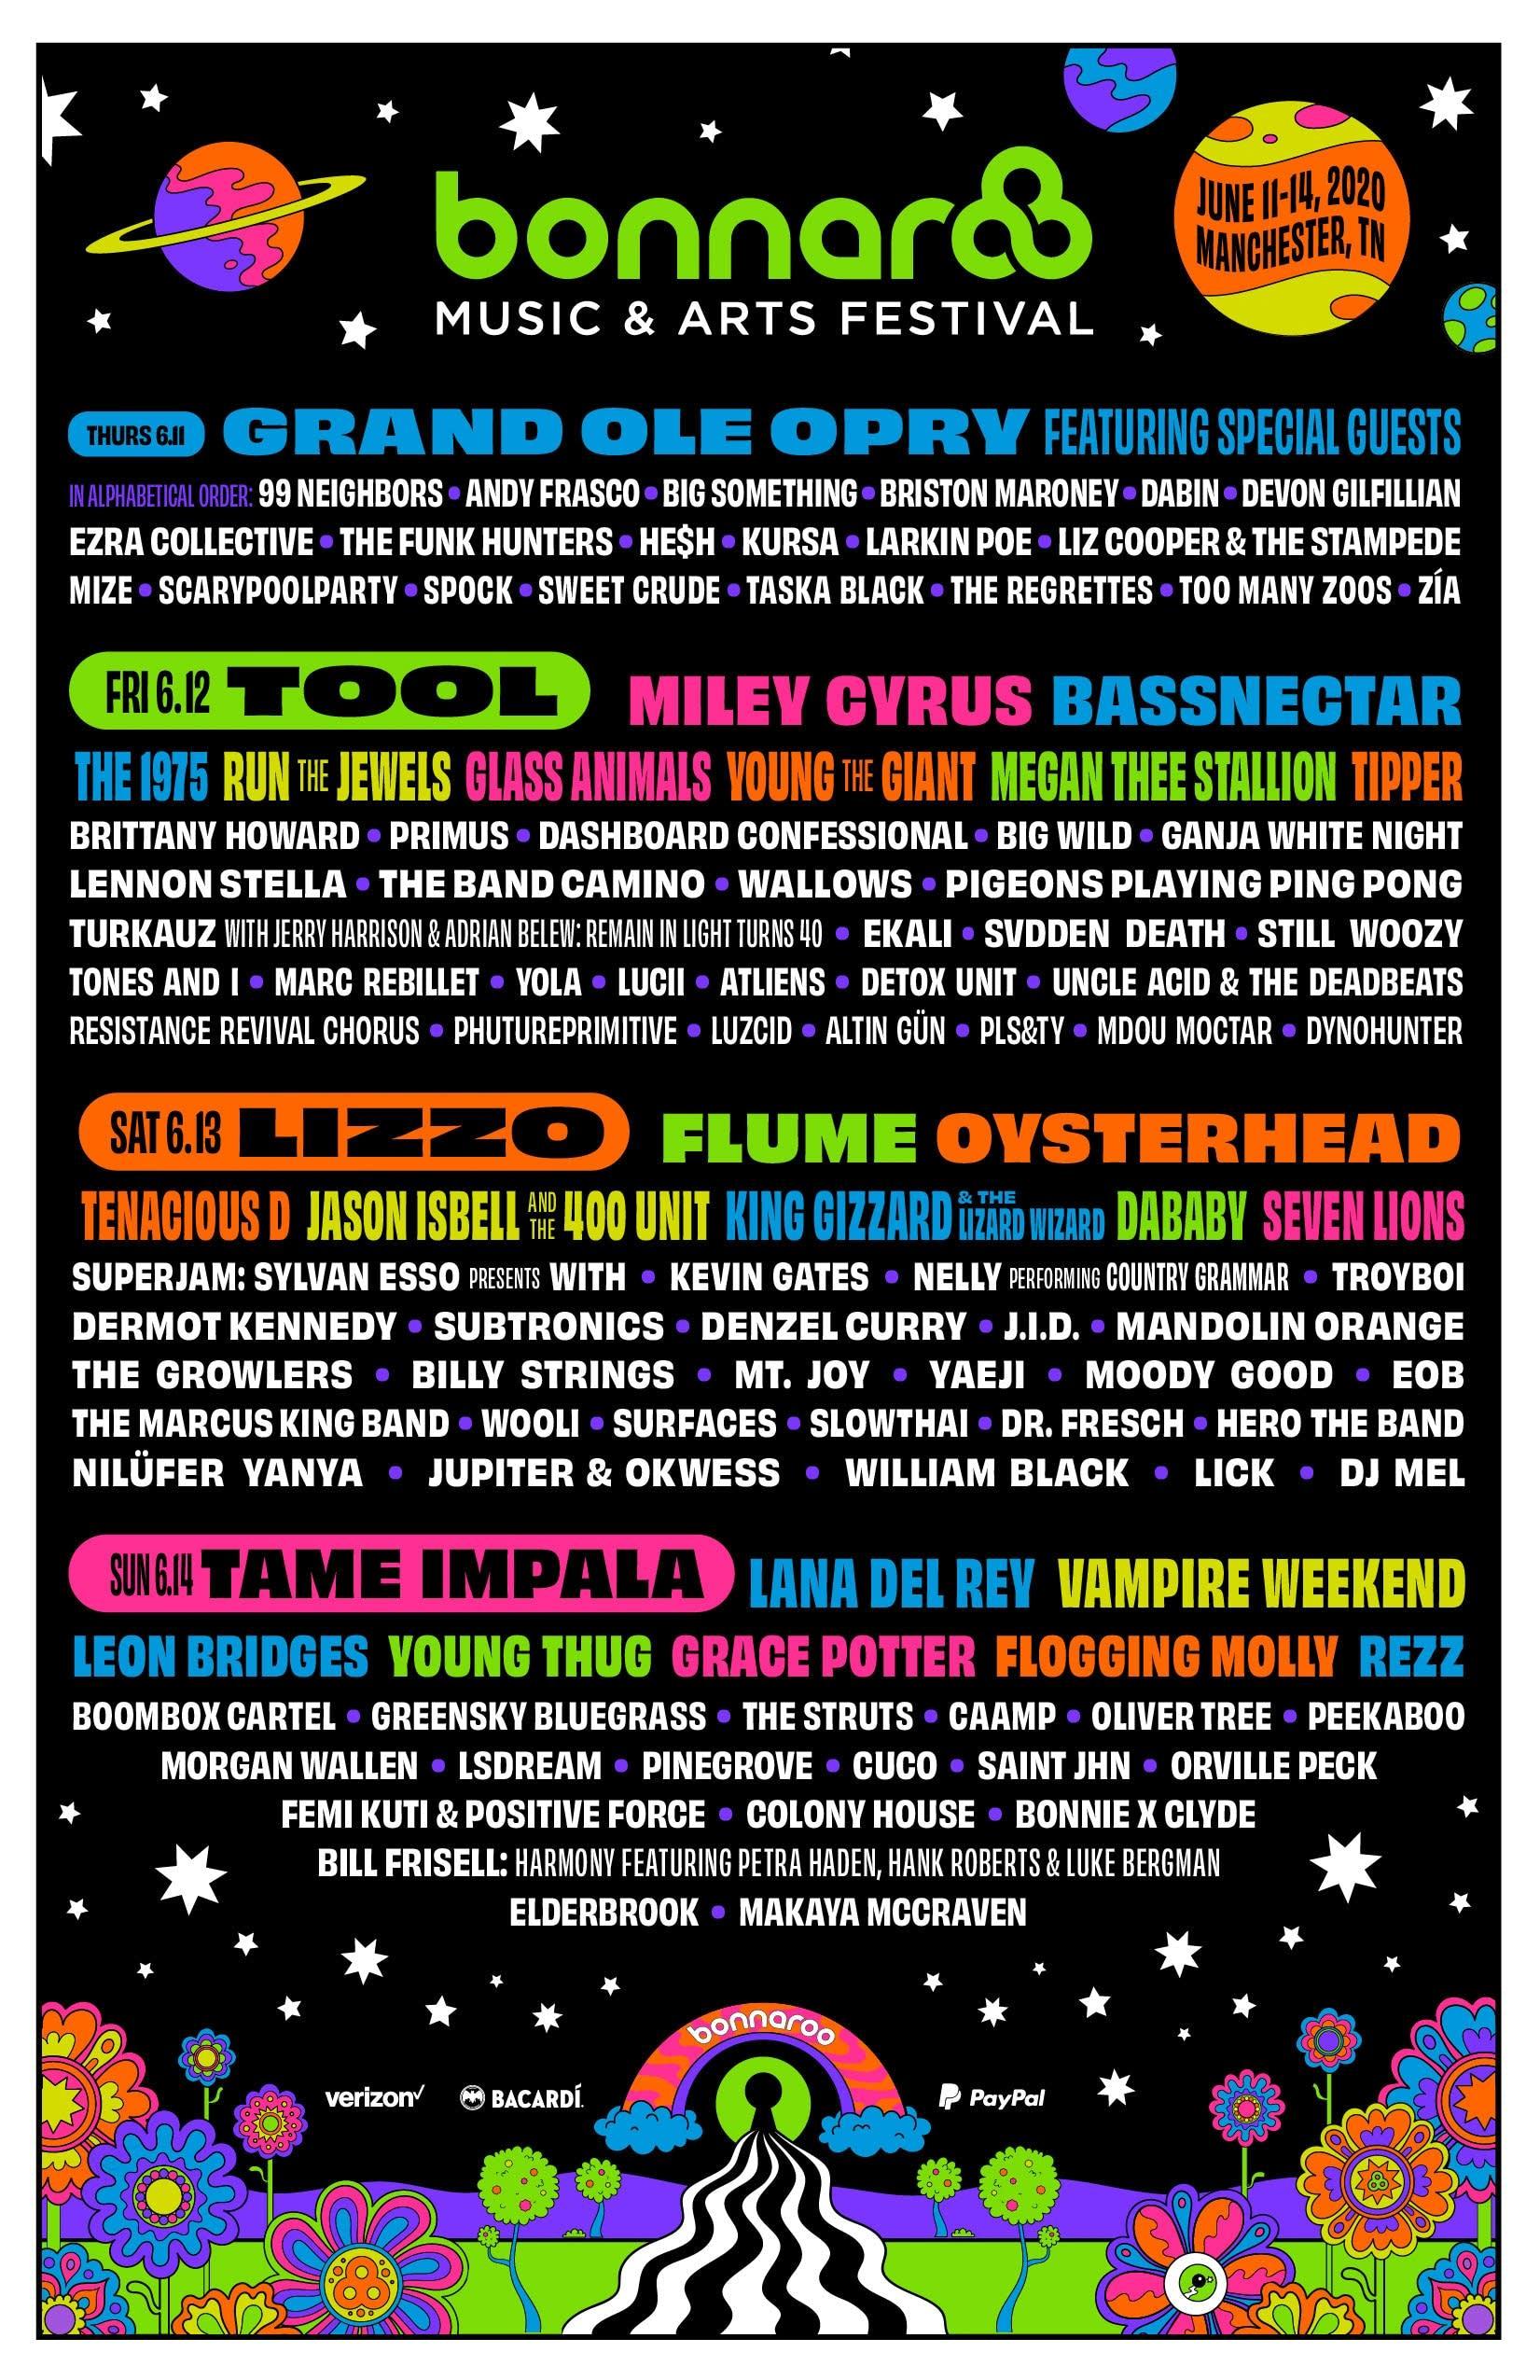 bonnaroo lineup with Tame Impala, Tool, Lizzo, and many many more